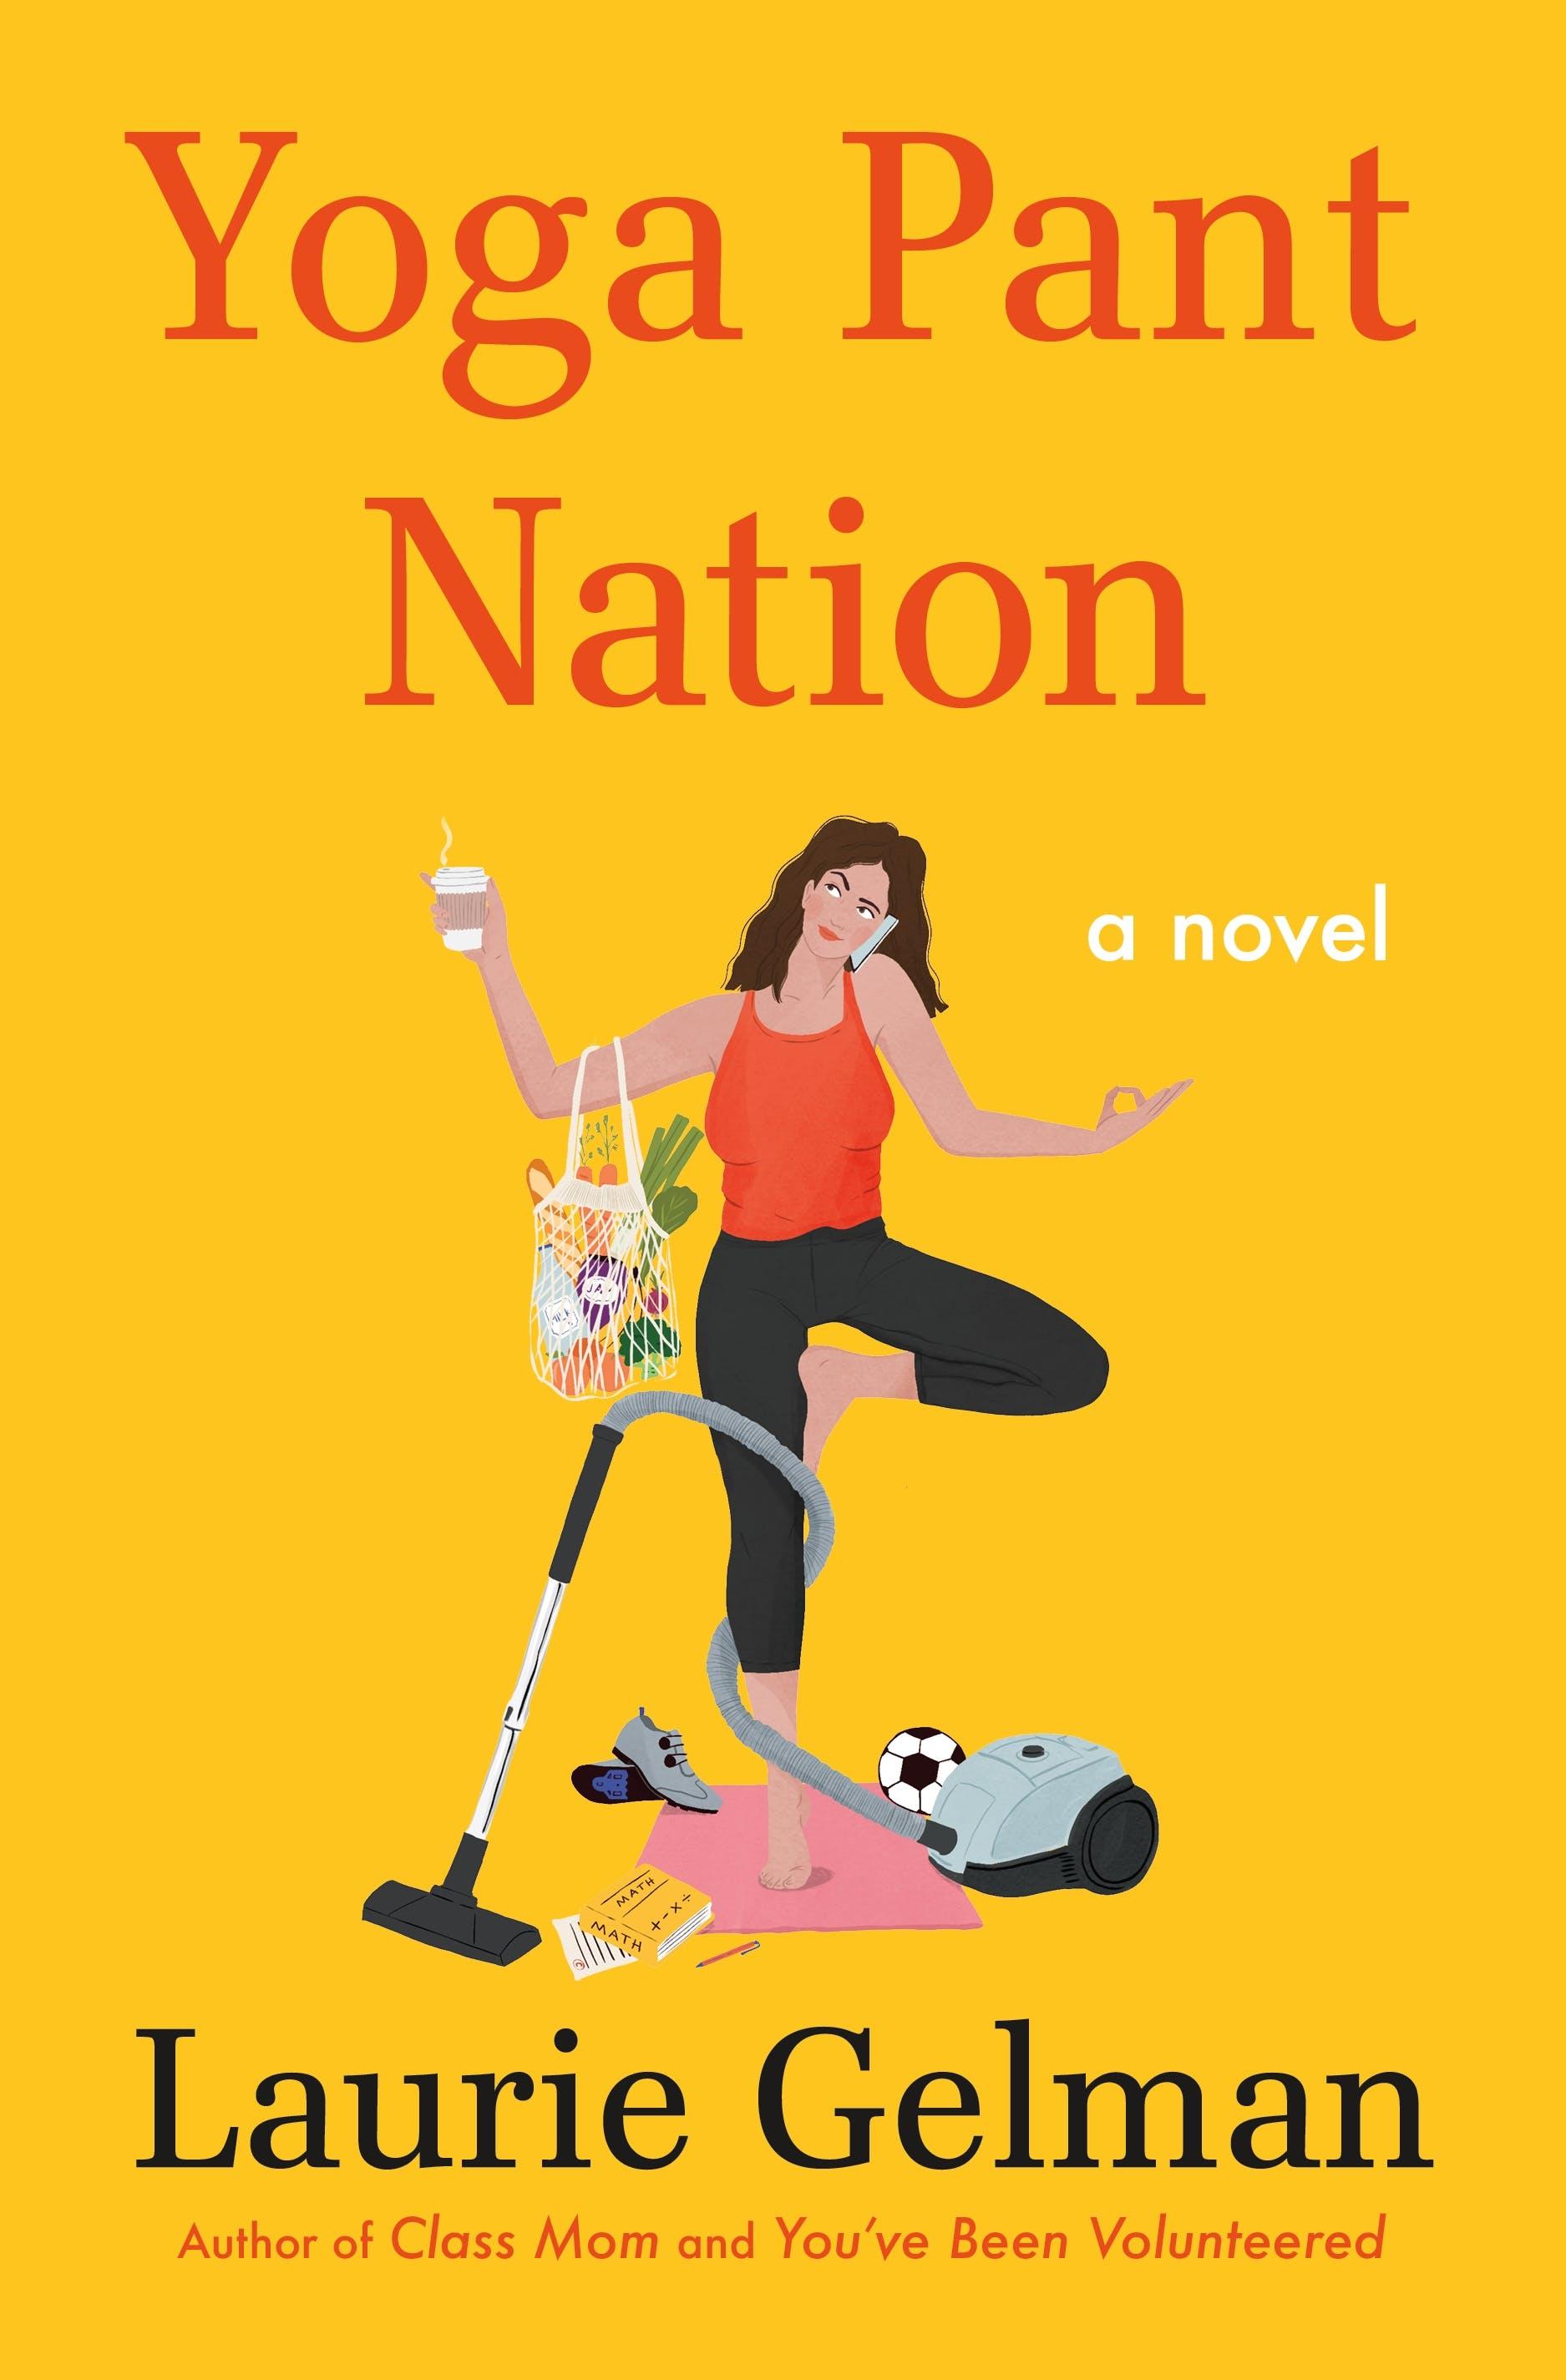 Image of Yoga Pant Nation